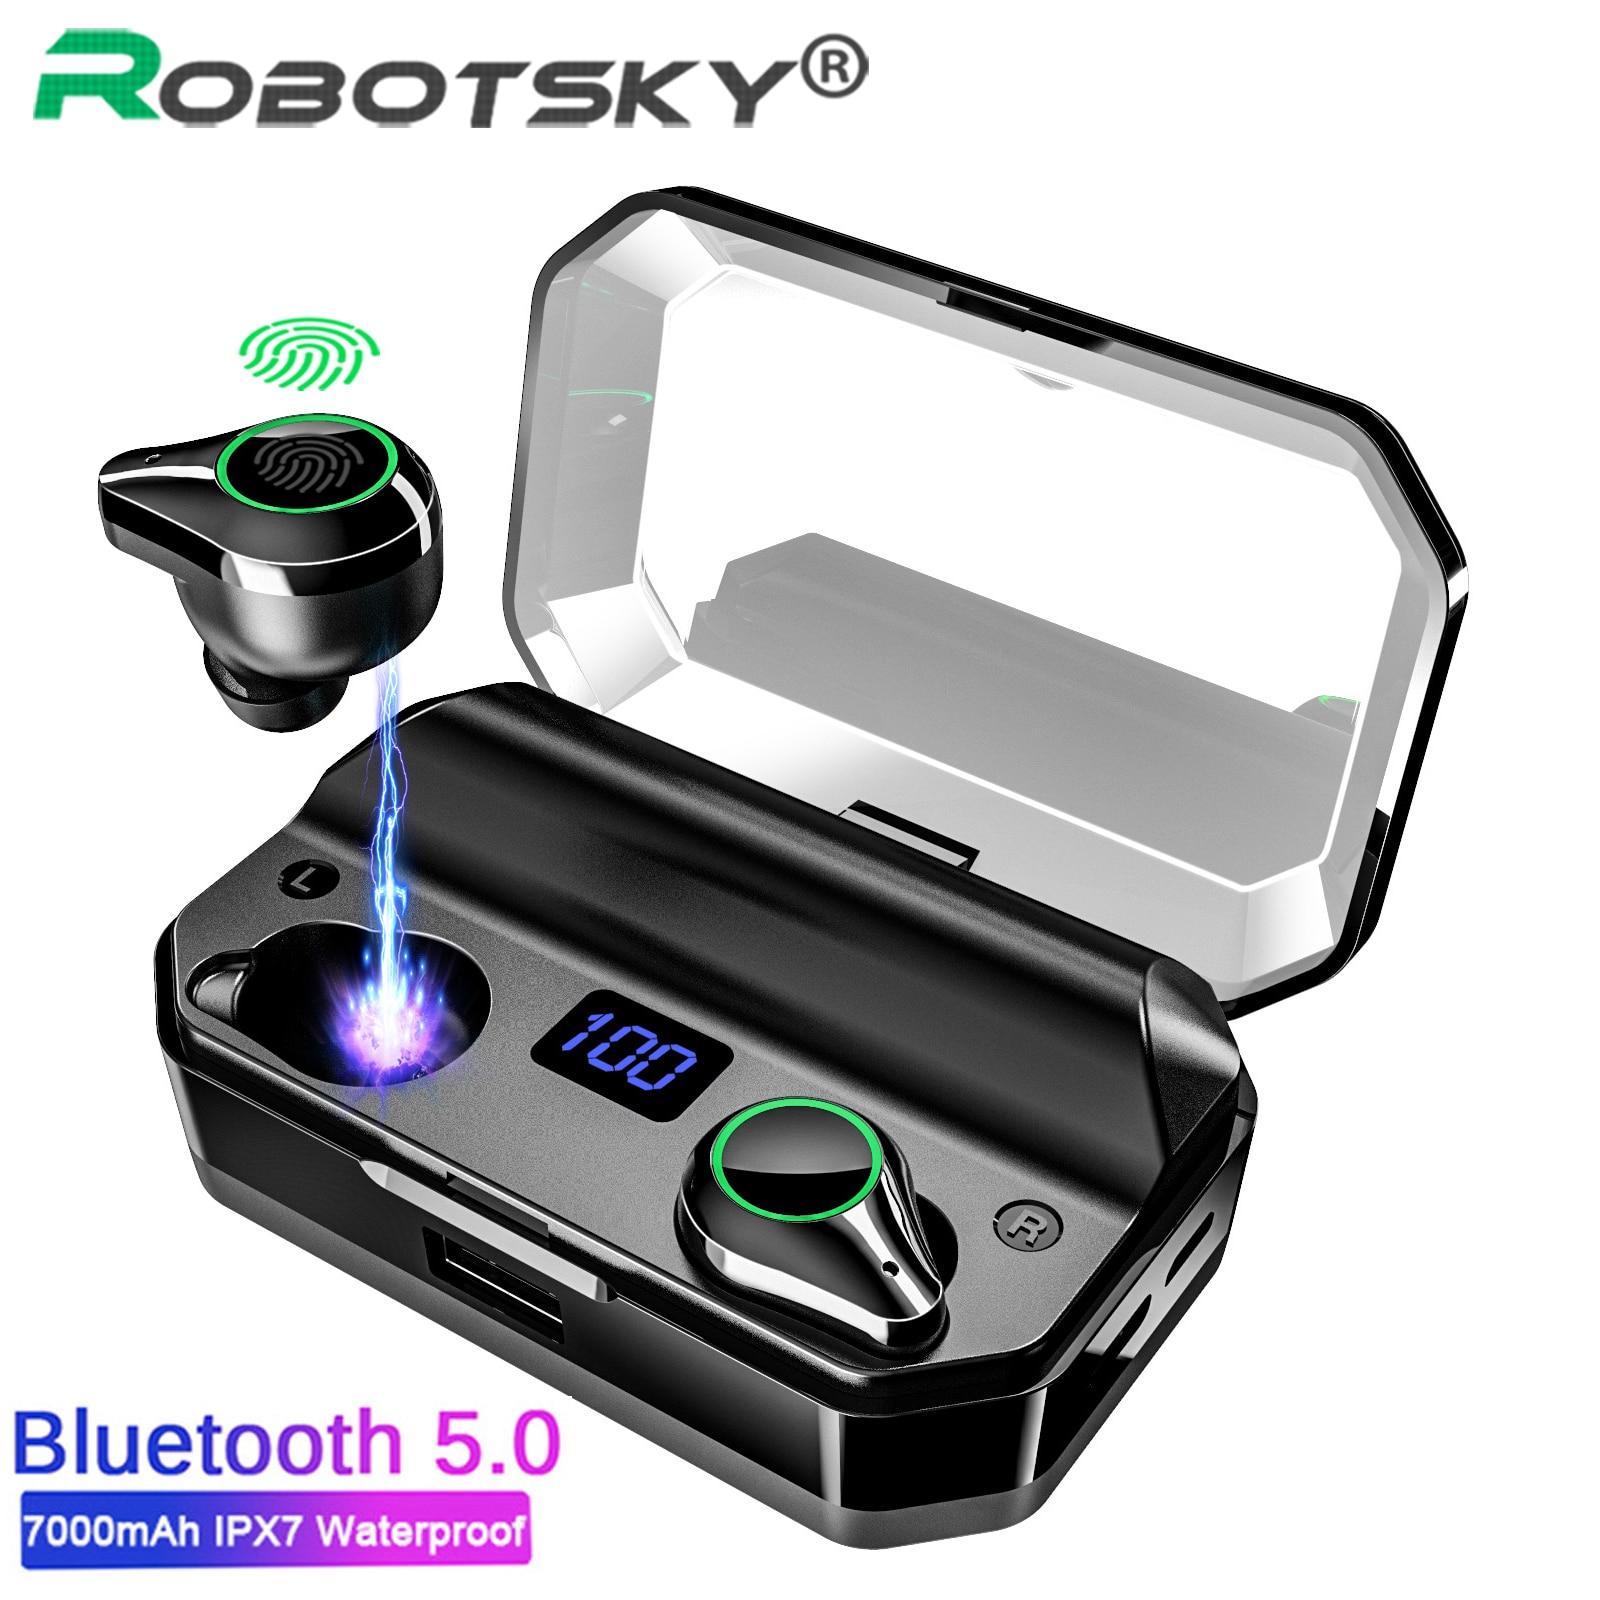 Auriculares inalámbricos Robotsky TWS Bluetooth V5.0 9D estéreo IPX7 resistente al agua 7000mAh banco de energía LED auriculares inalámbricos Auriculares auriculares